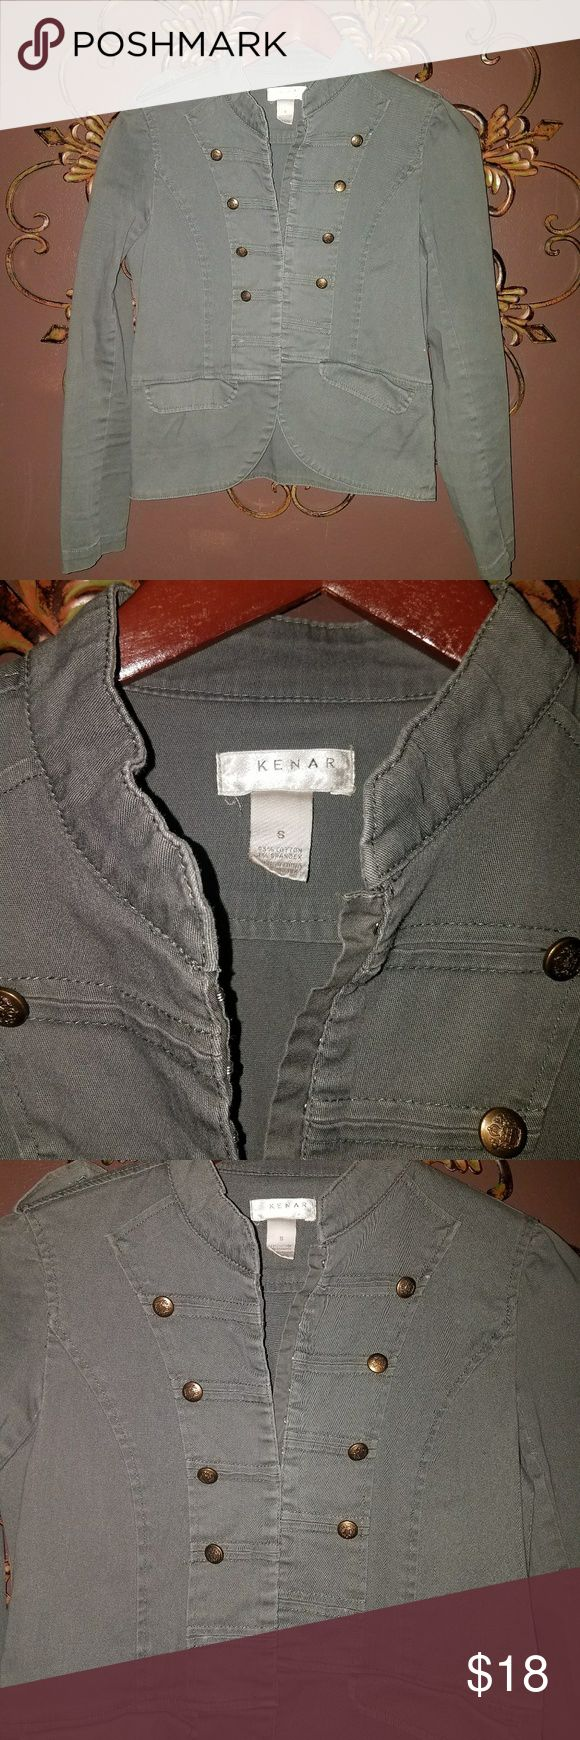 Military Cut Jacket Kenar Military Cut Jacket size Small Mild Peplum waistline Dark grey Kenar Jackets & Coats Utility Jackets